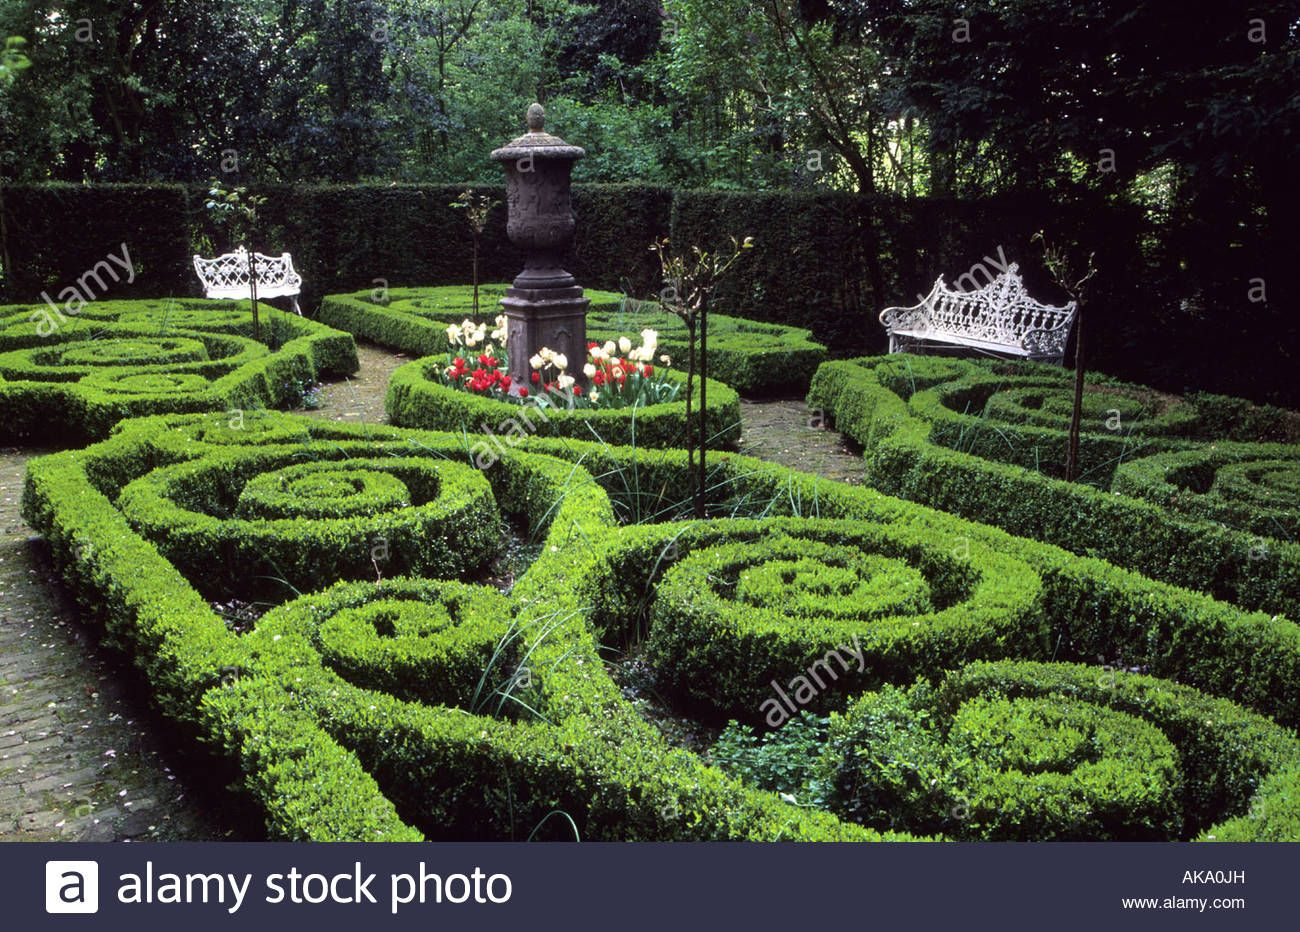 Image result for knot garden Boxwood garden, Hedges